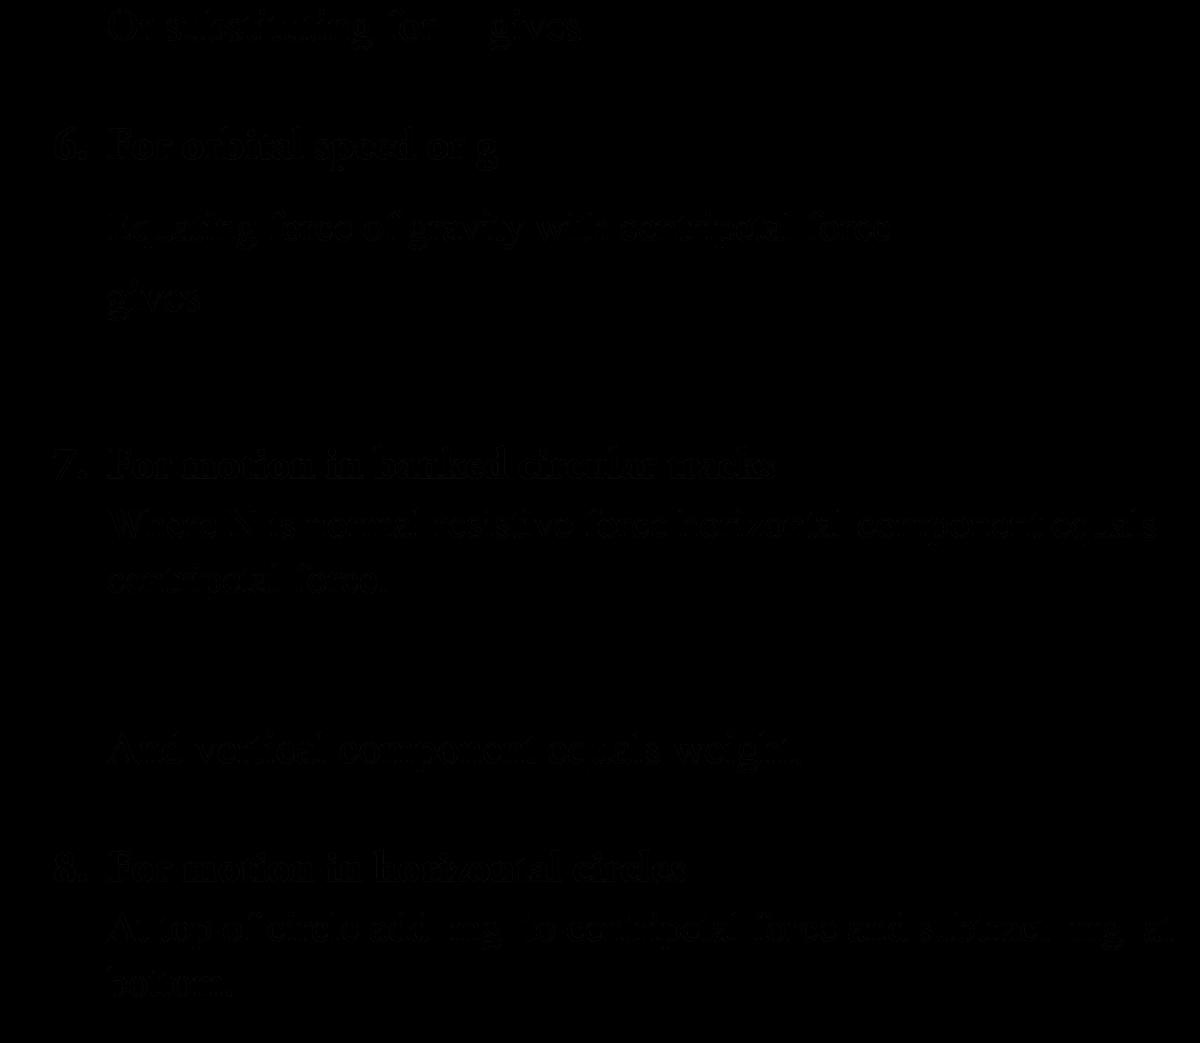 A Level Physics Formula Sheet - Circular Motion